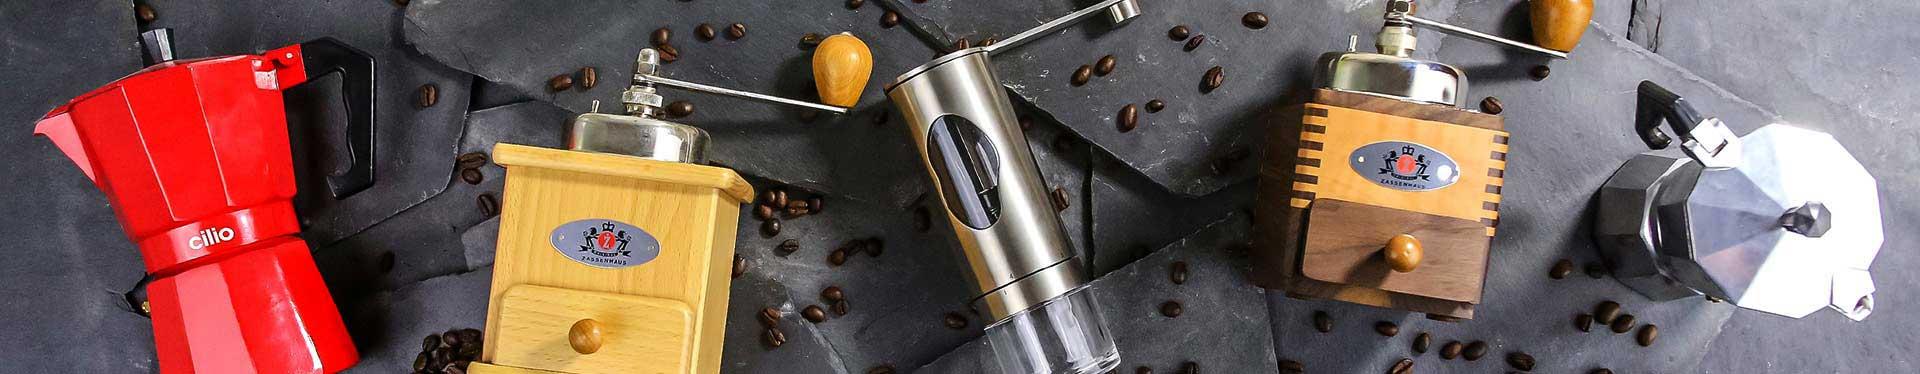 Kaffeezubereitung mit Kaffeebereiter & Espressokocher